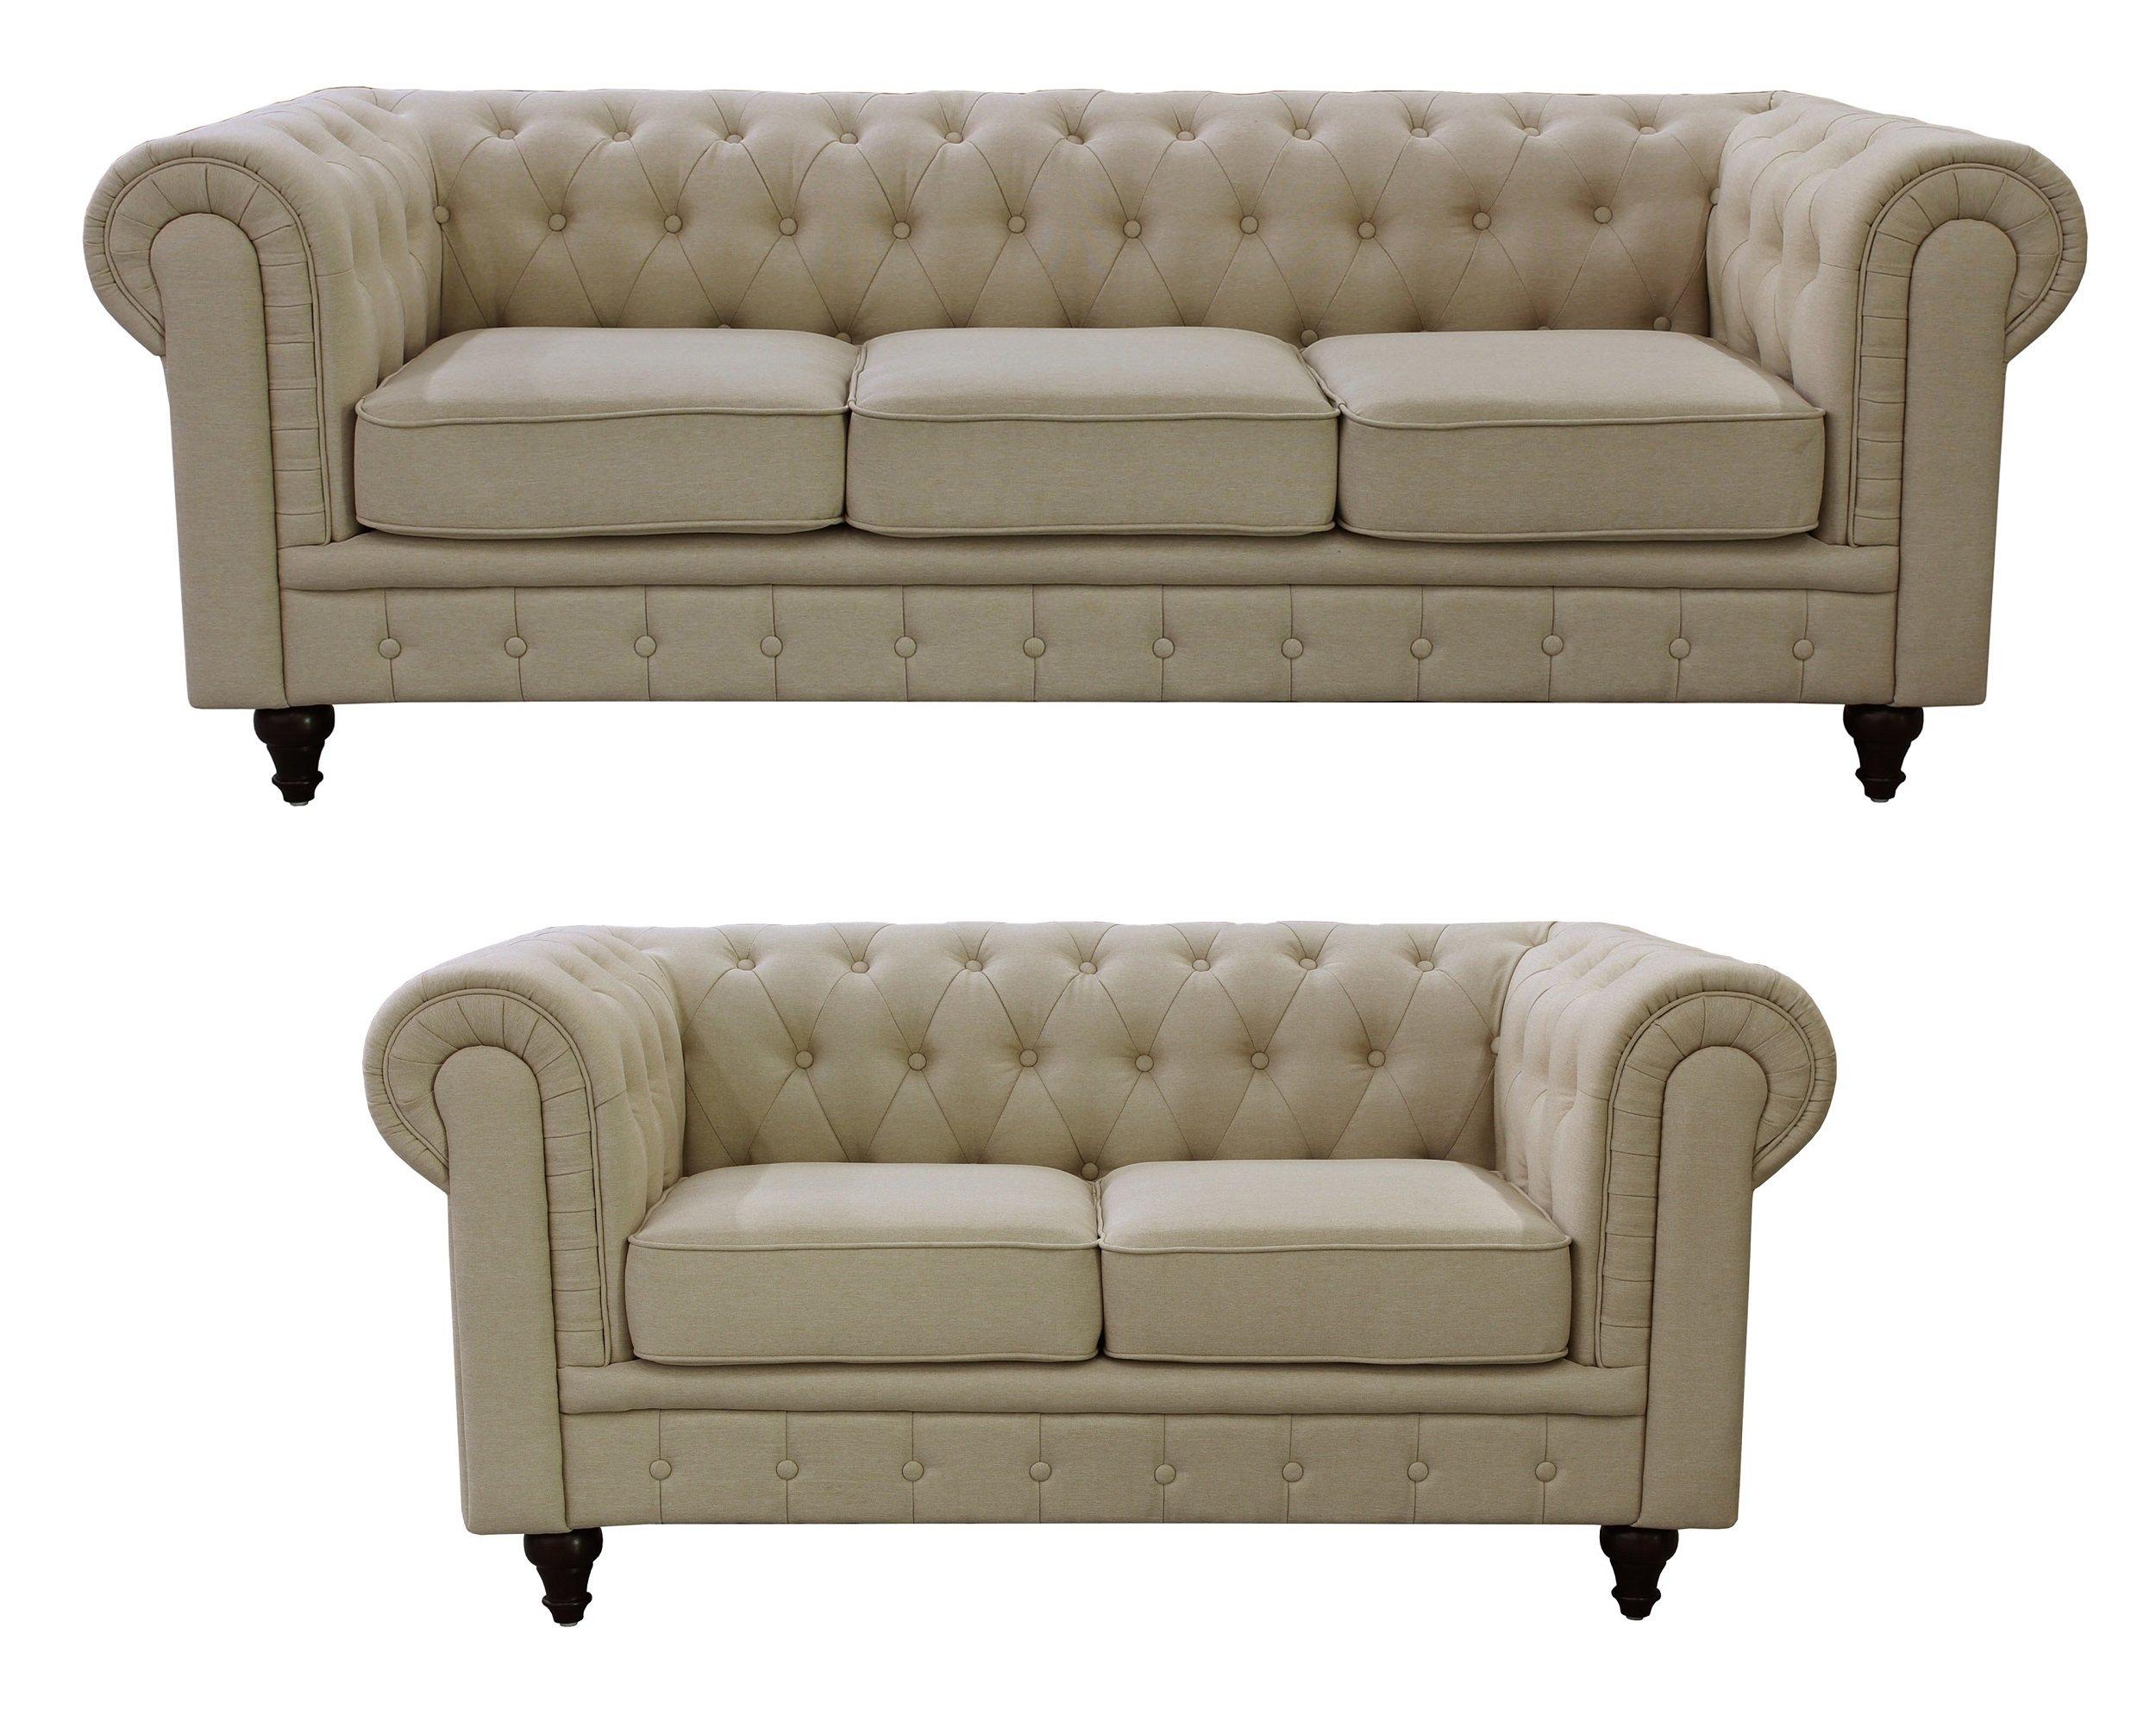 US Pride Furniture S5071 2PC Linen Fabric Chesterfield Sofa Set, Beige